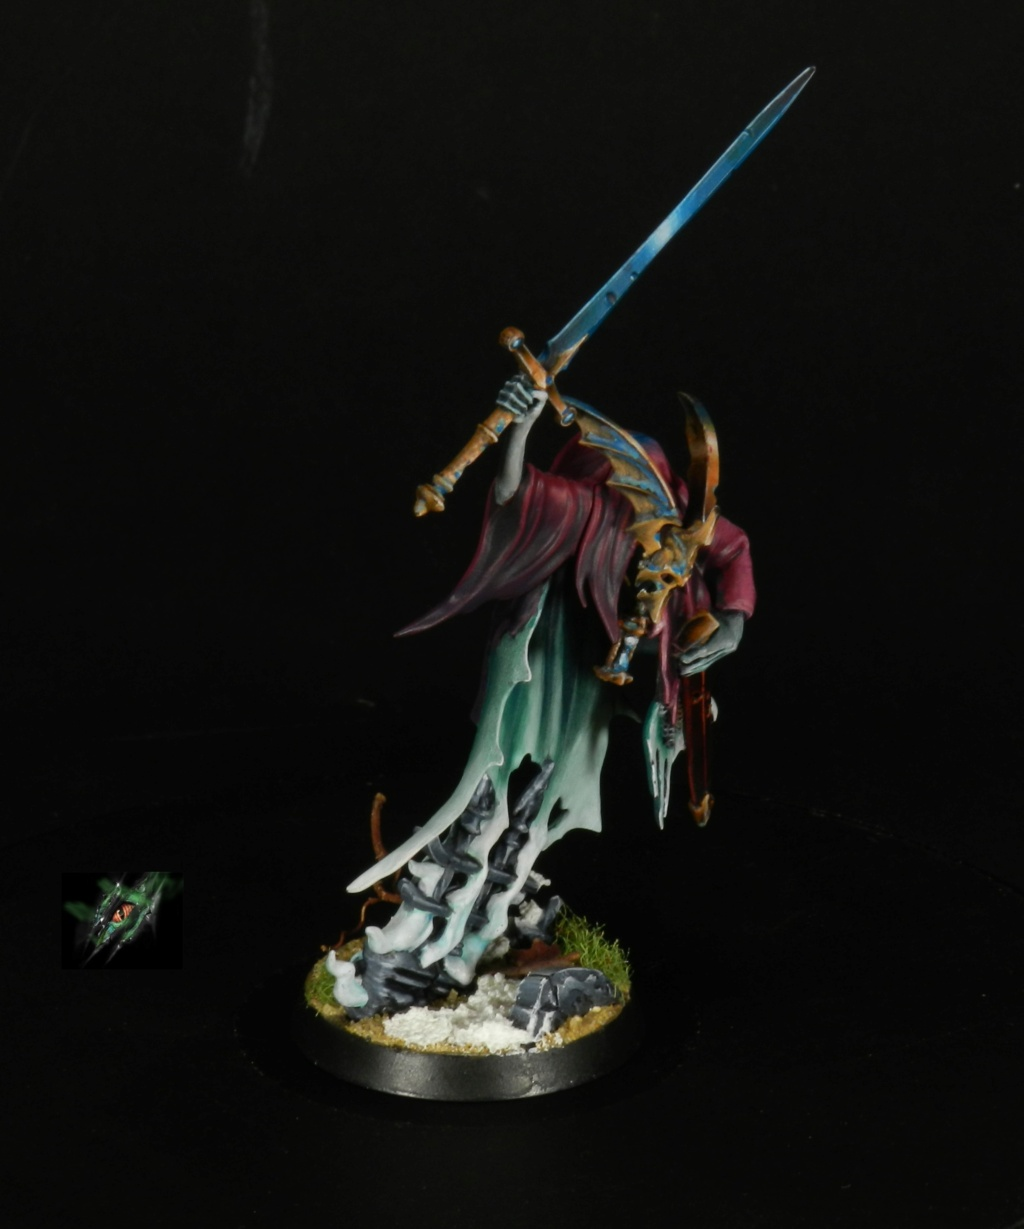 Les figurines de Flako Dscn4810